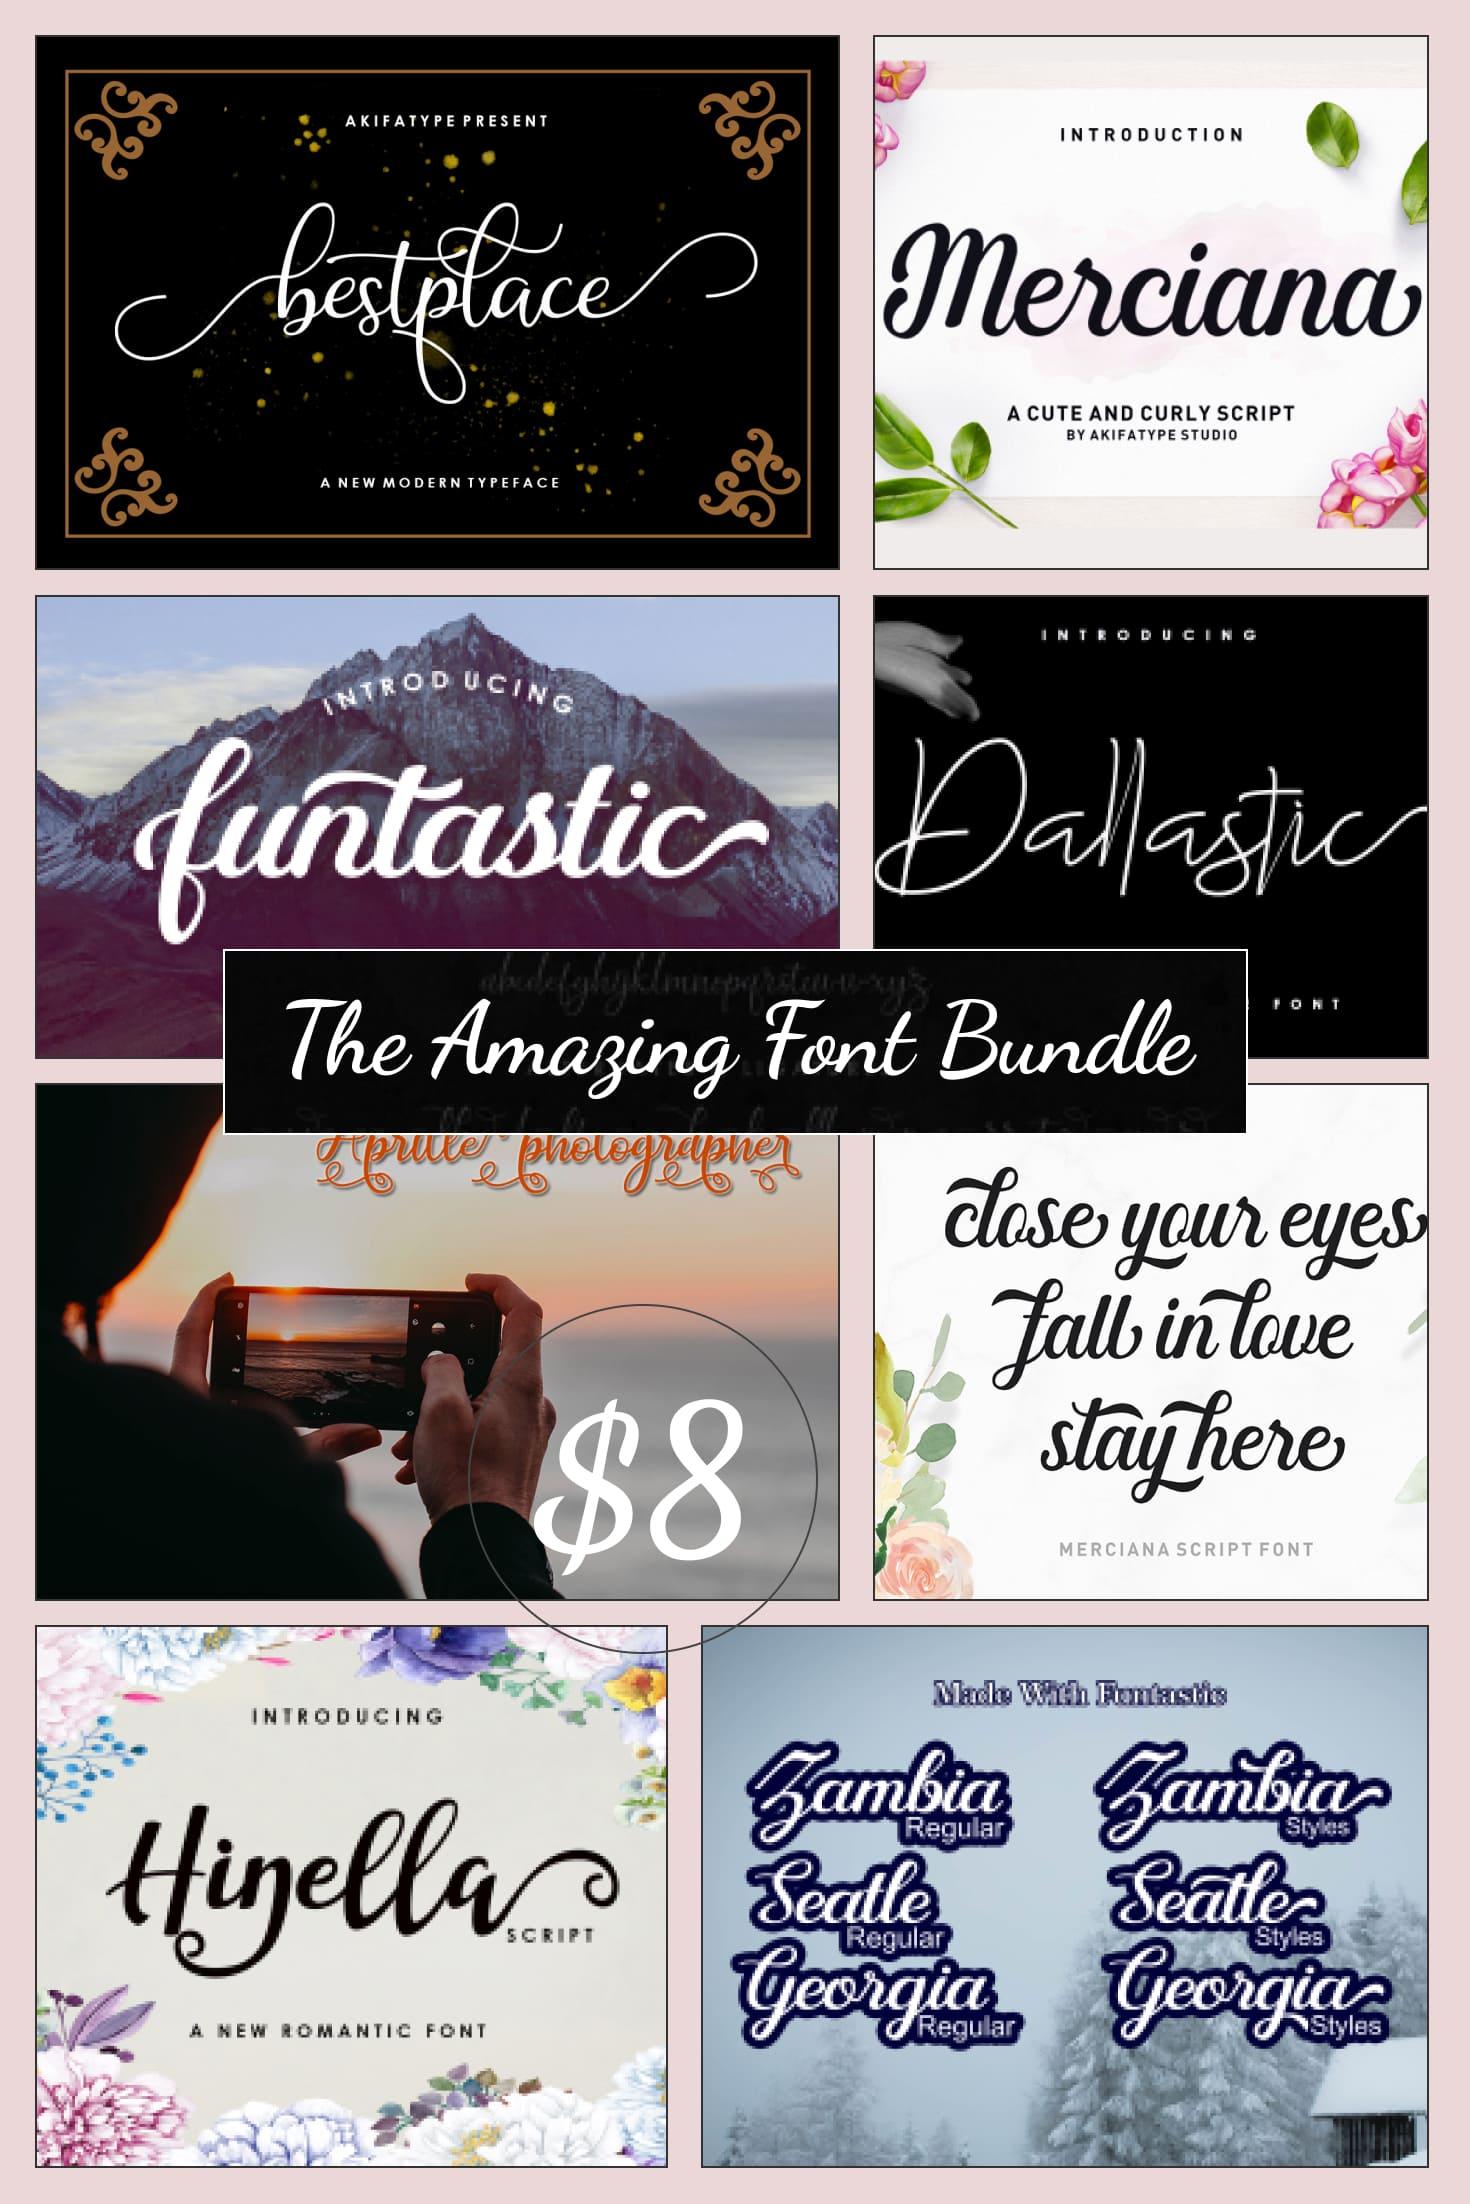 Pinterest Image: The Amazing Font Bundle - 8 Typefaces $8 only.